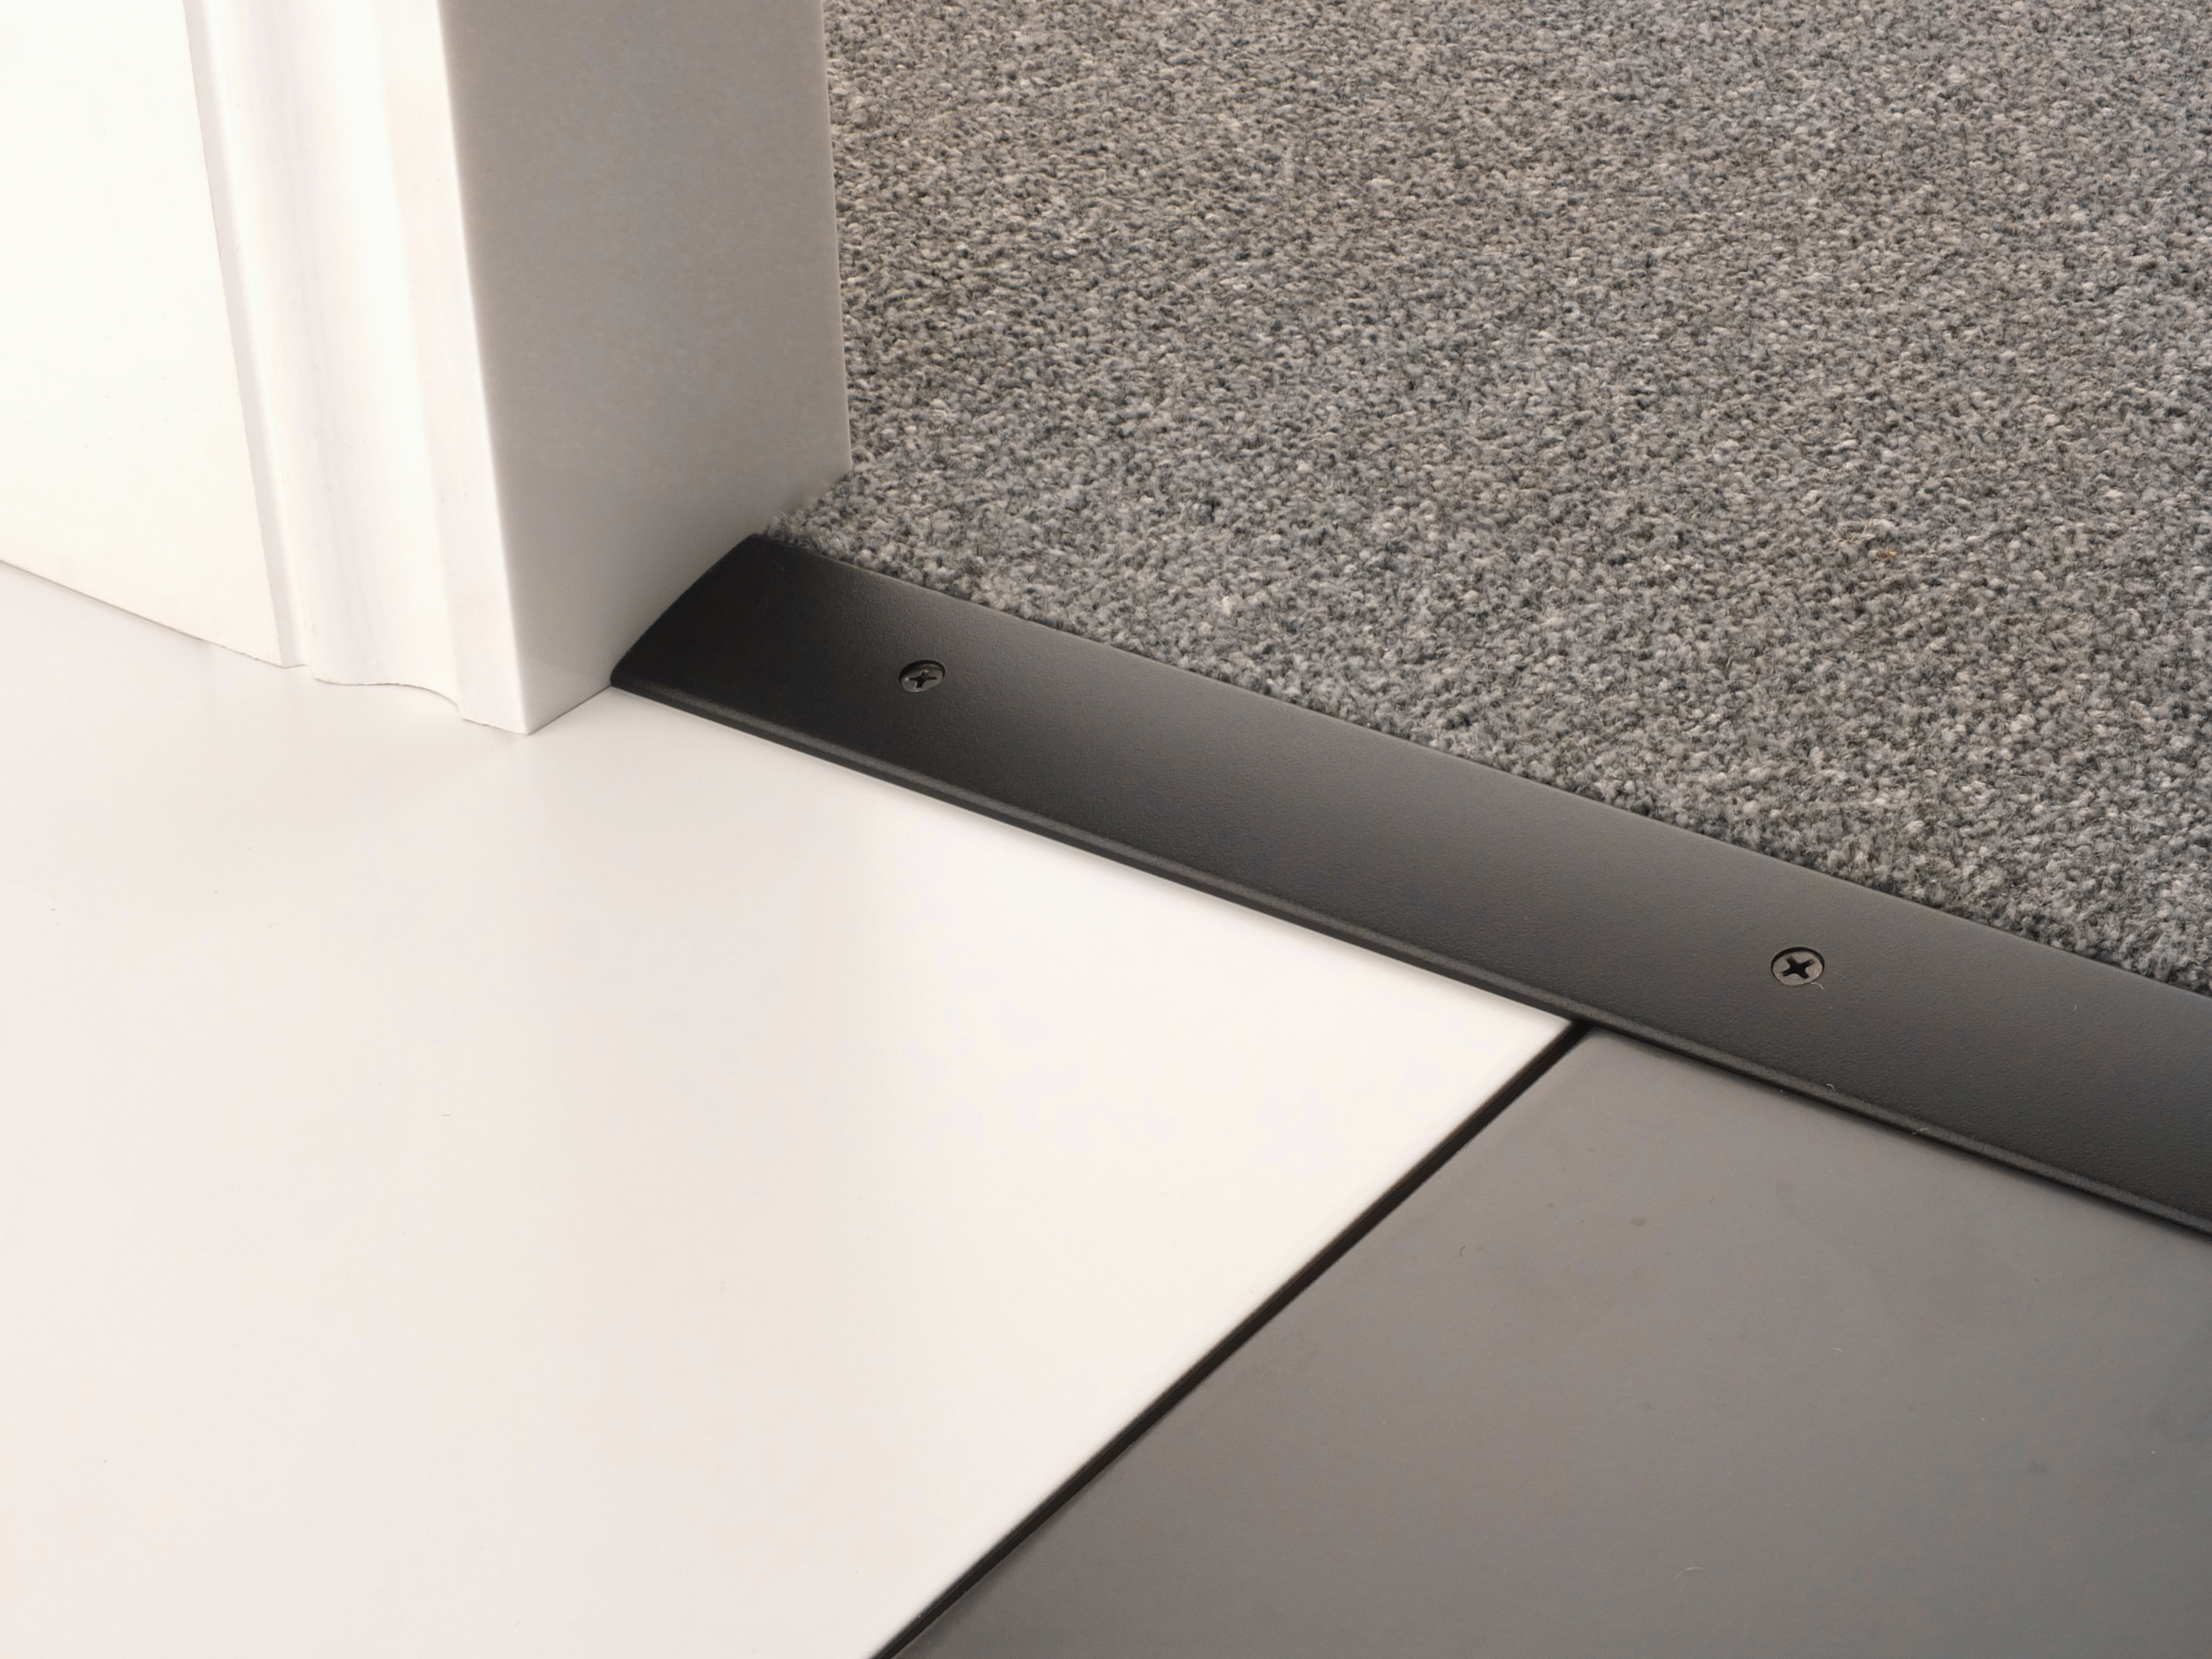 stairrods-doorbar-black-cover-carpet-hard-floor.jpg